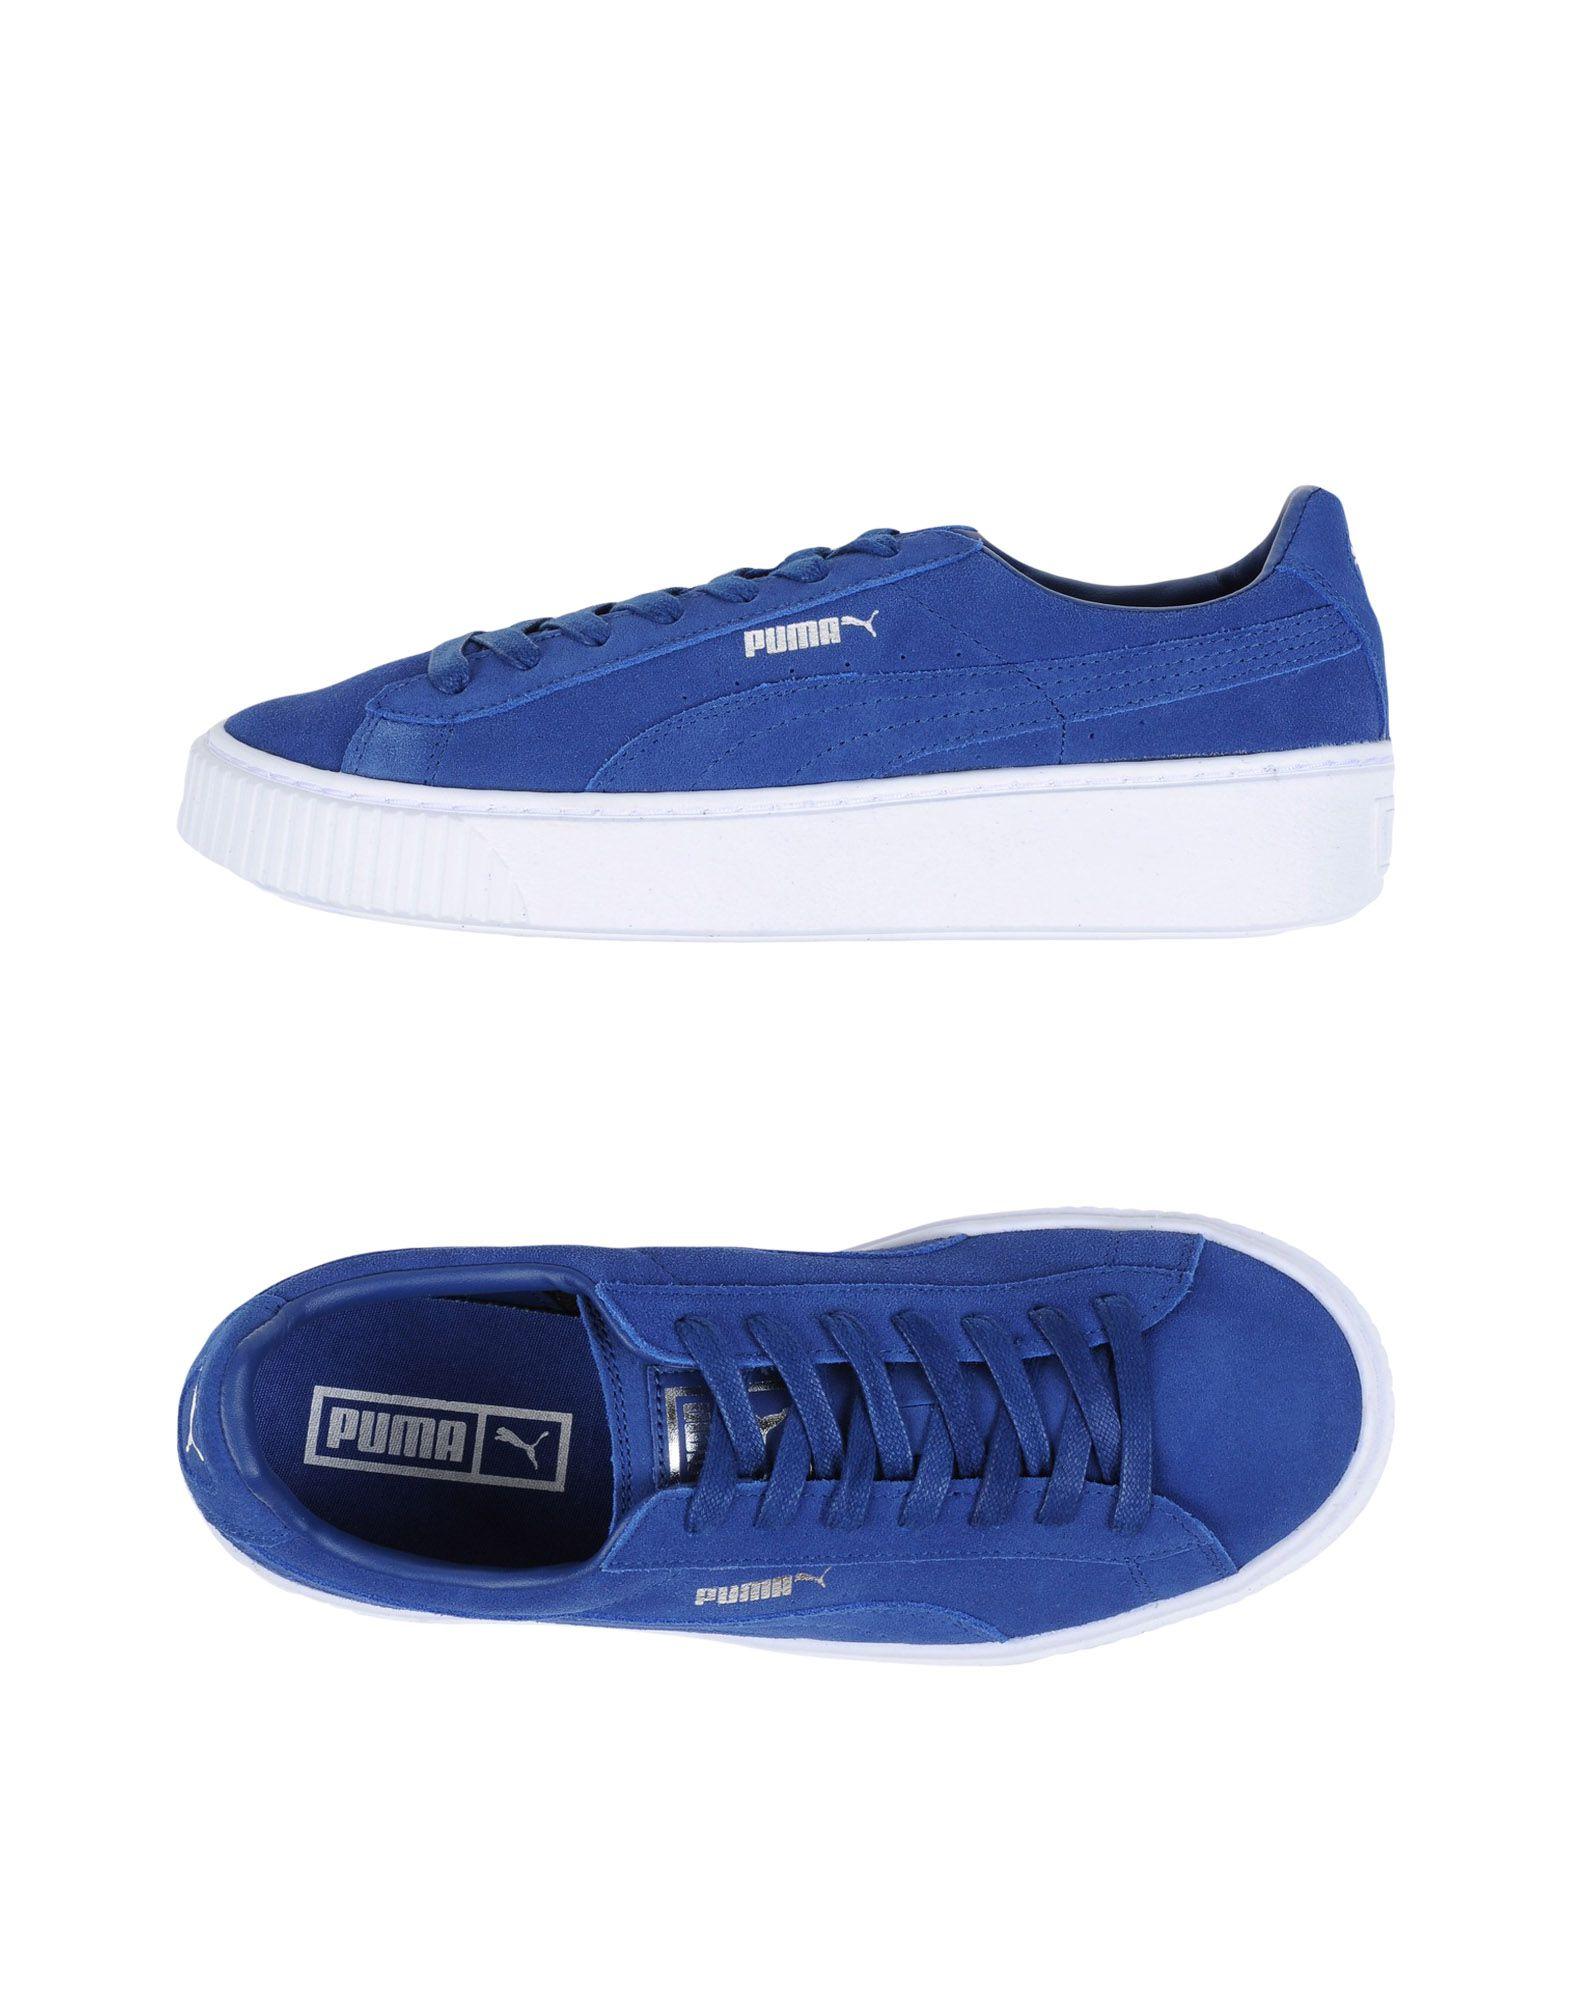 PUMA Damen Low Sneakers & Tennisschuhe Farbe Königsblau Größe 11